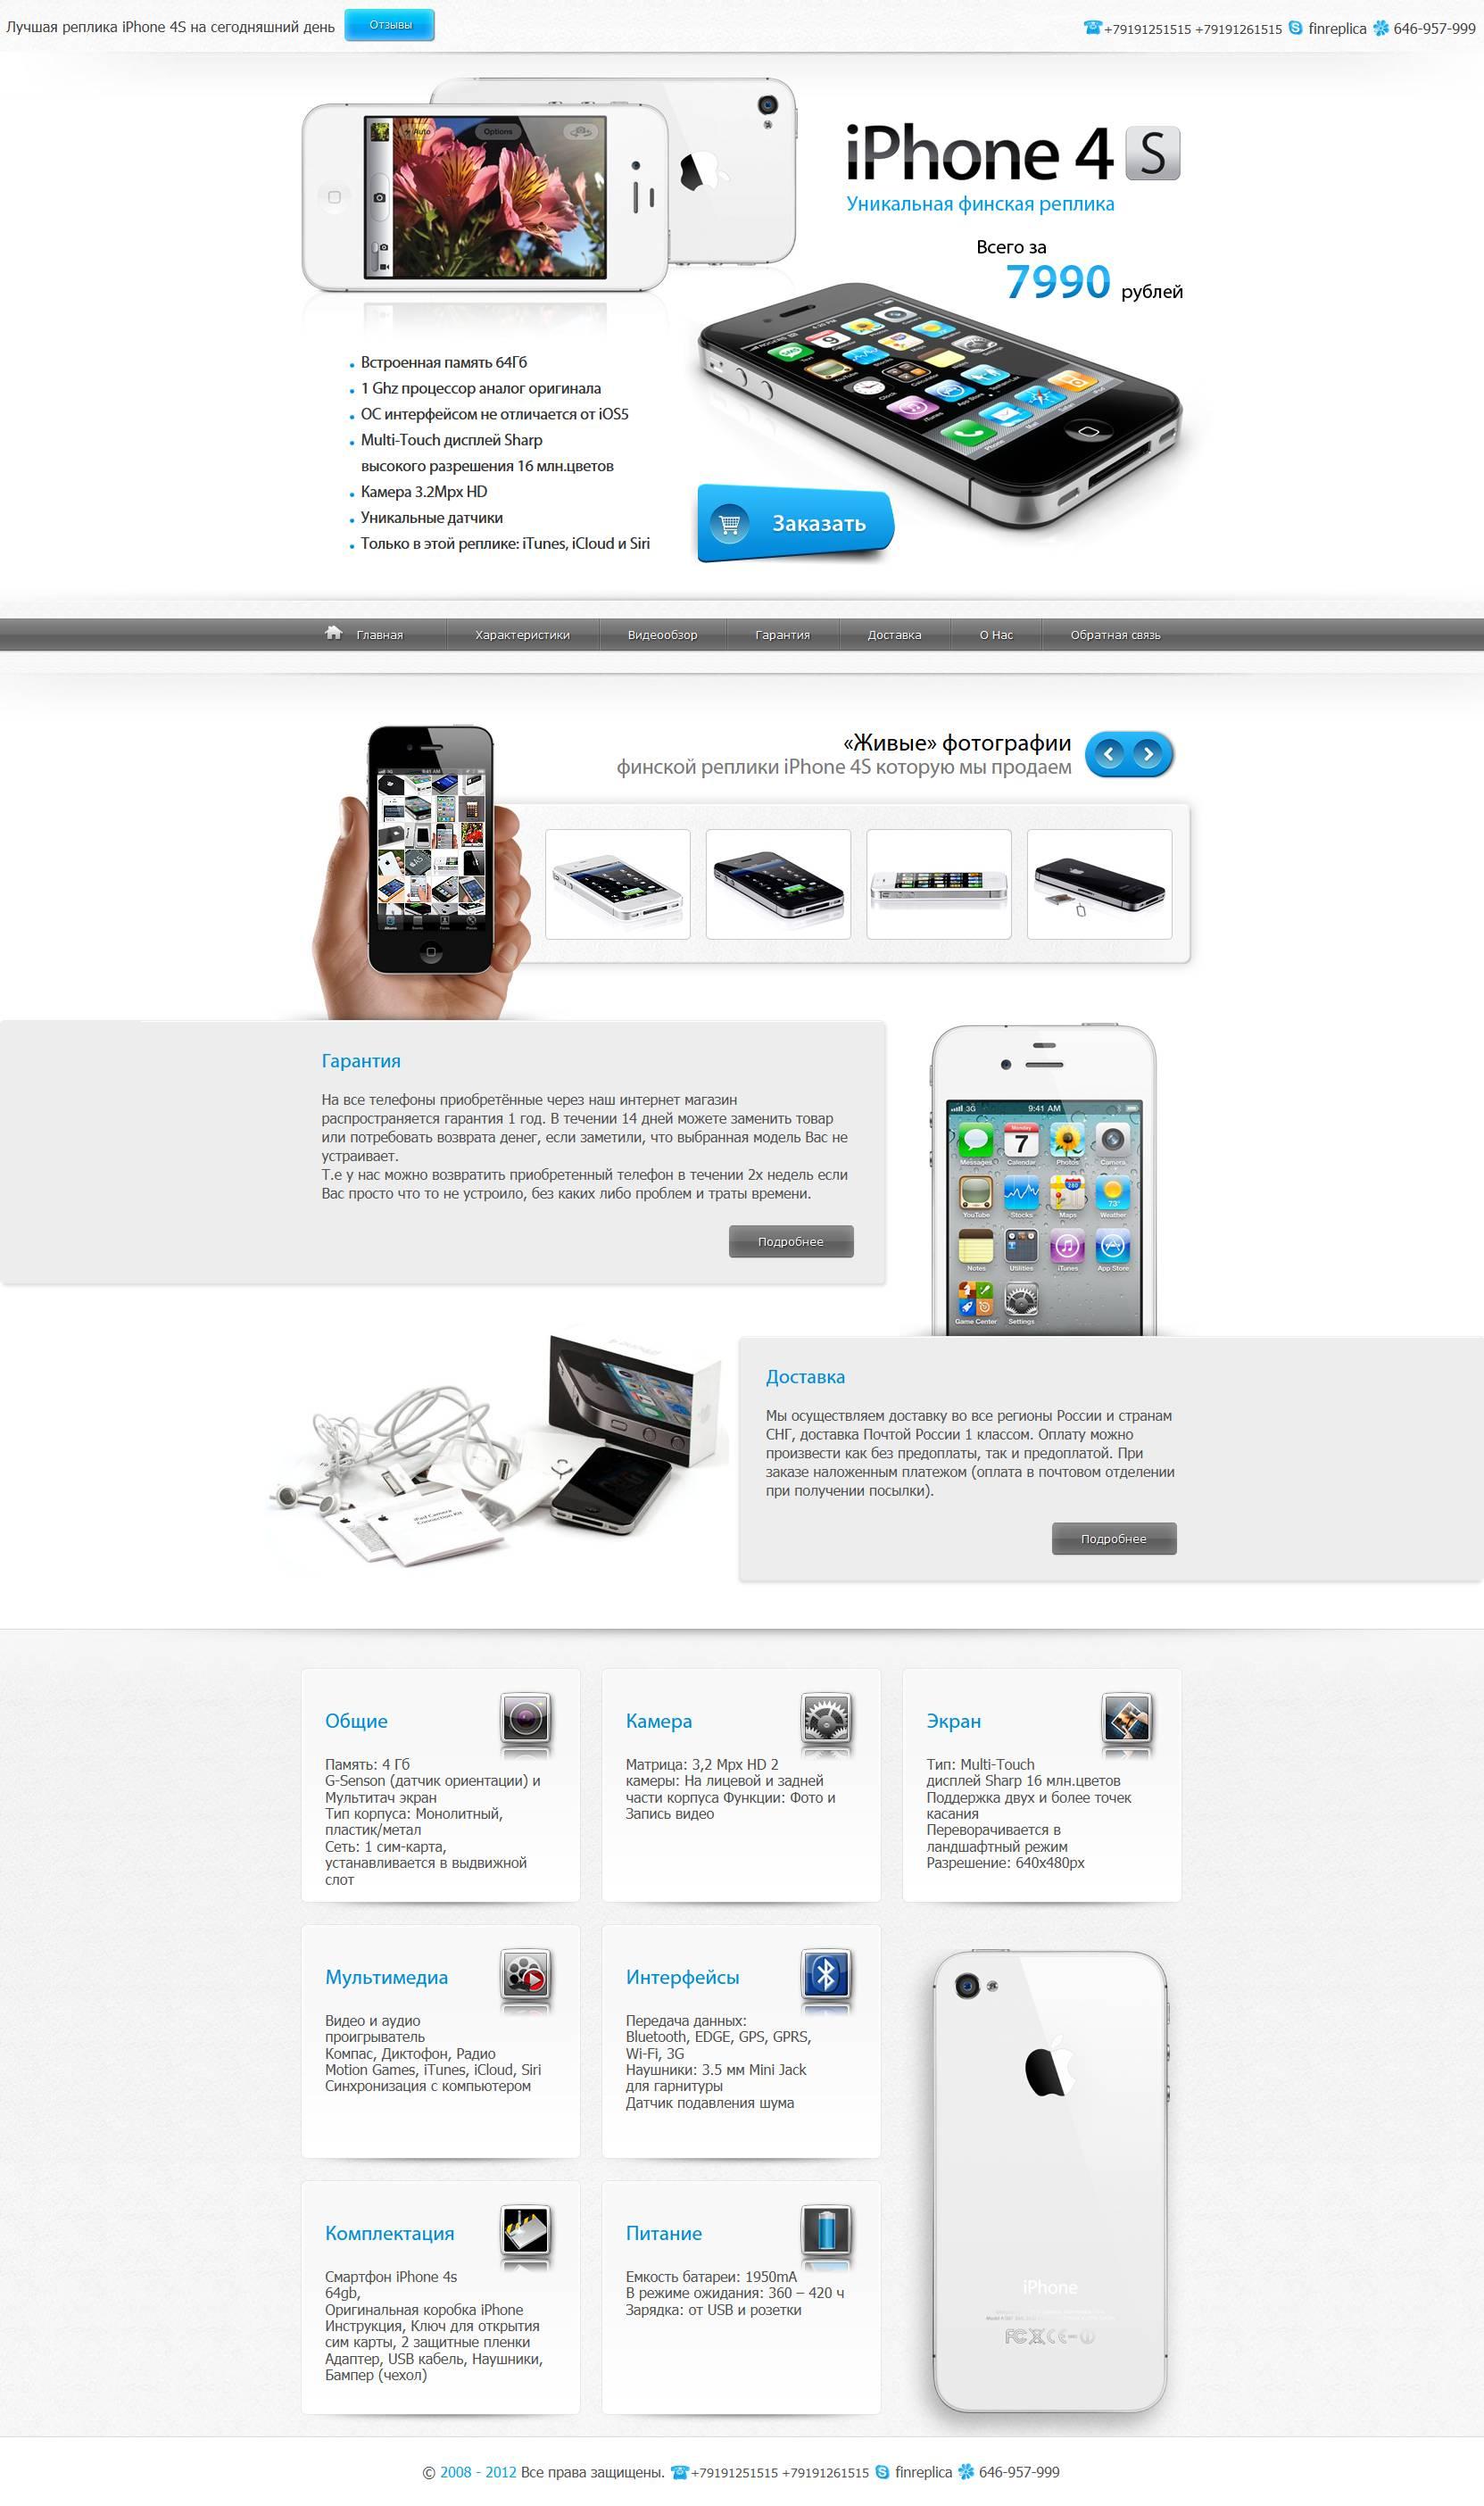 Реплика iPhone 4S - главная